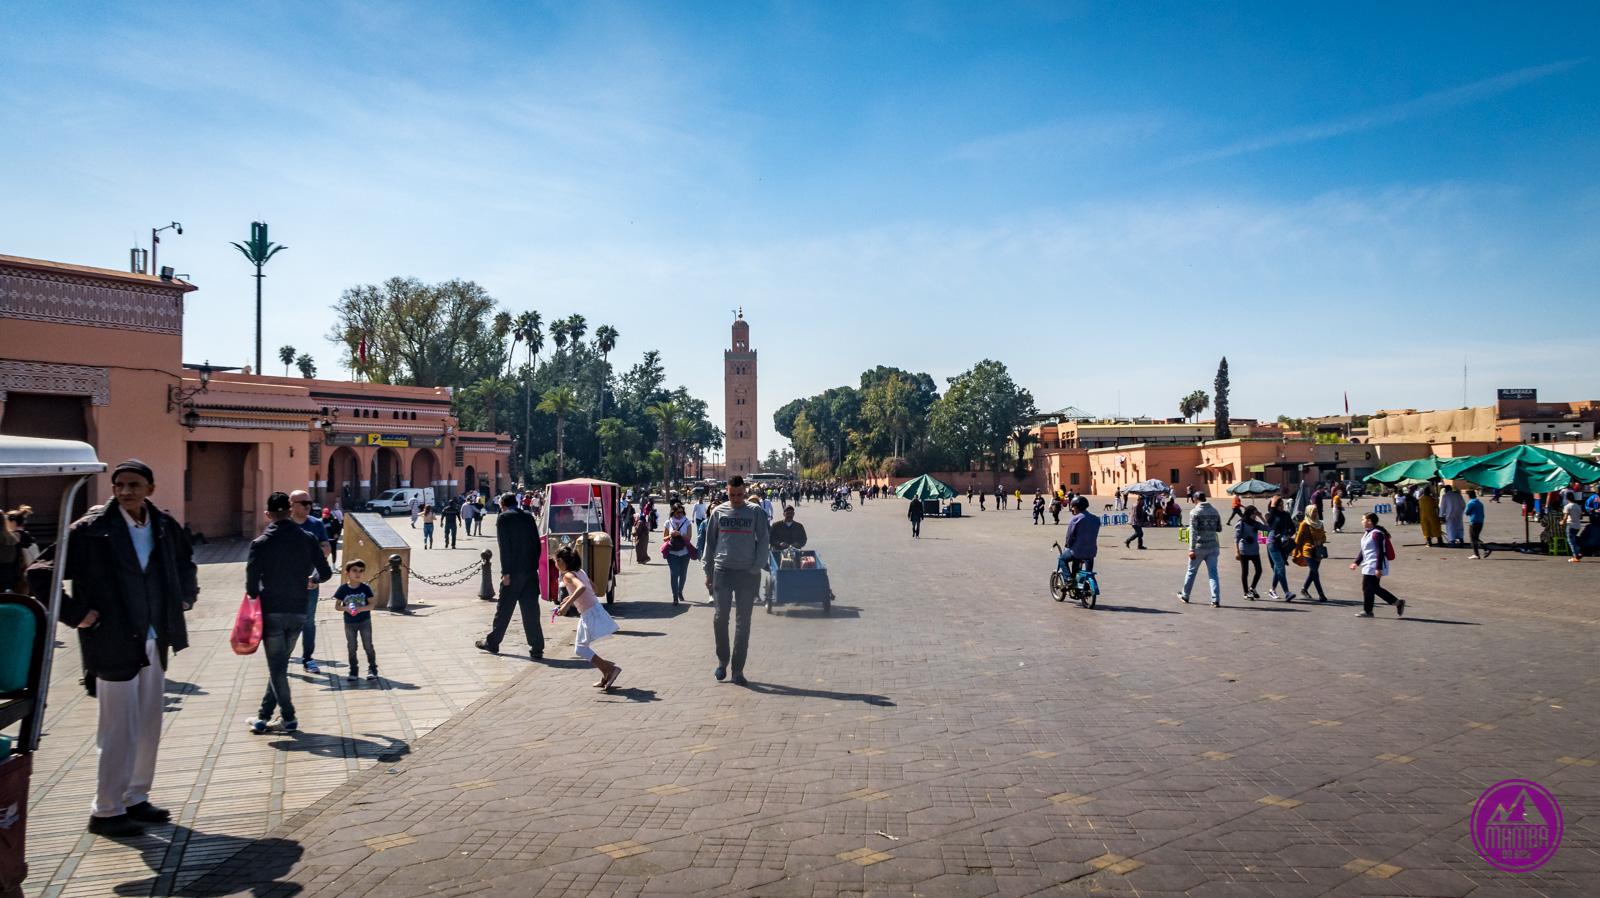 Maroko plac Dżami al-Fana